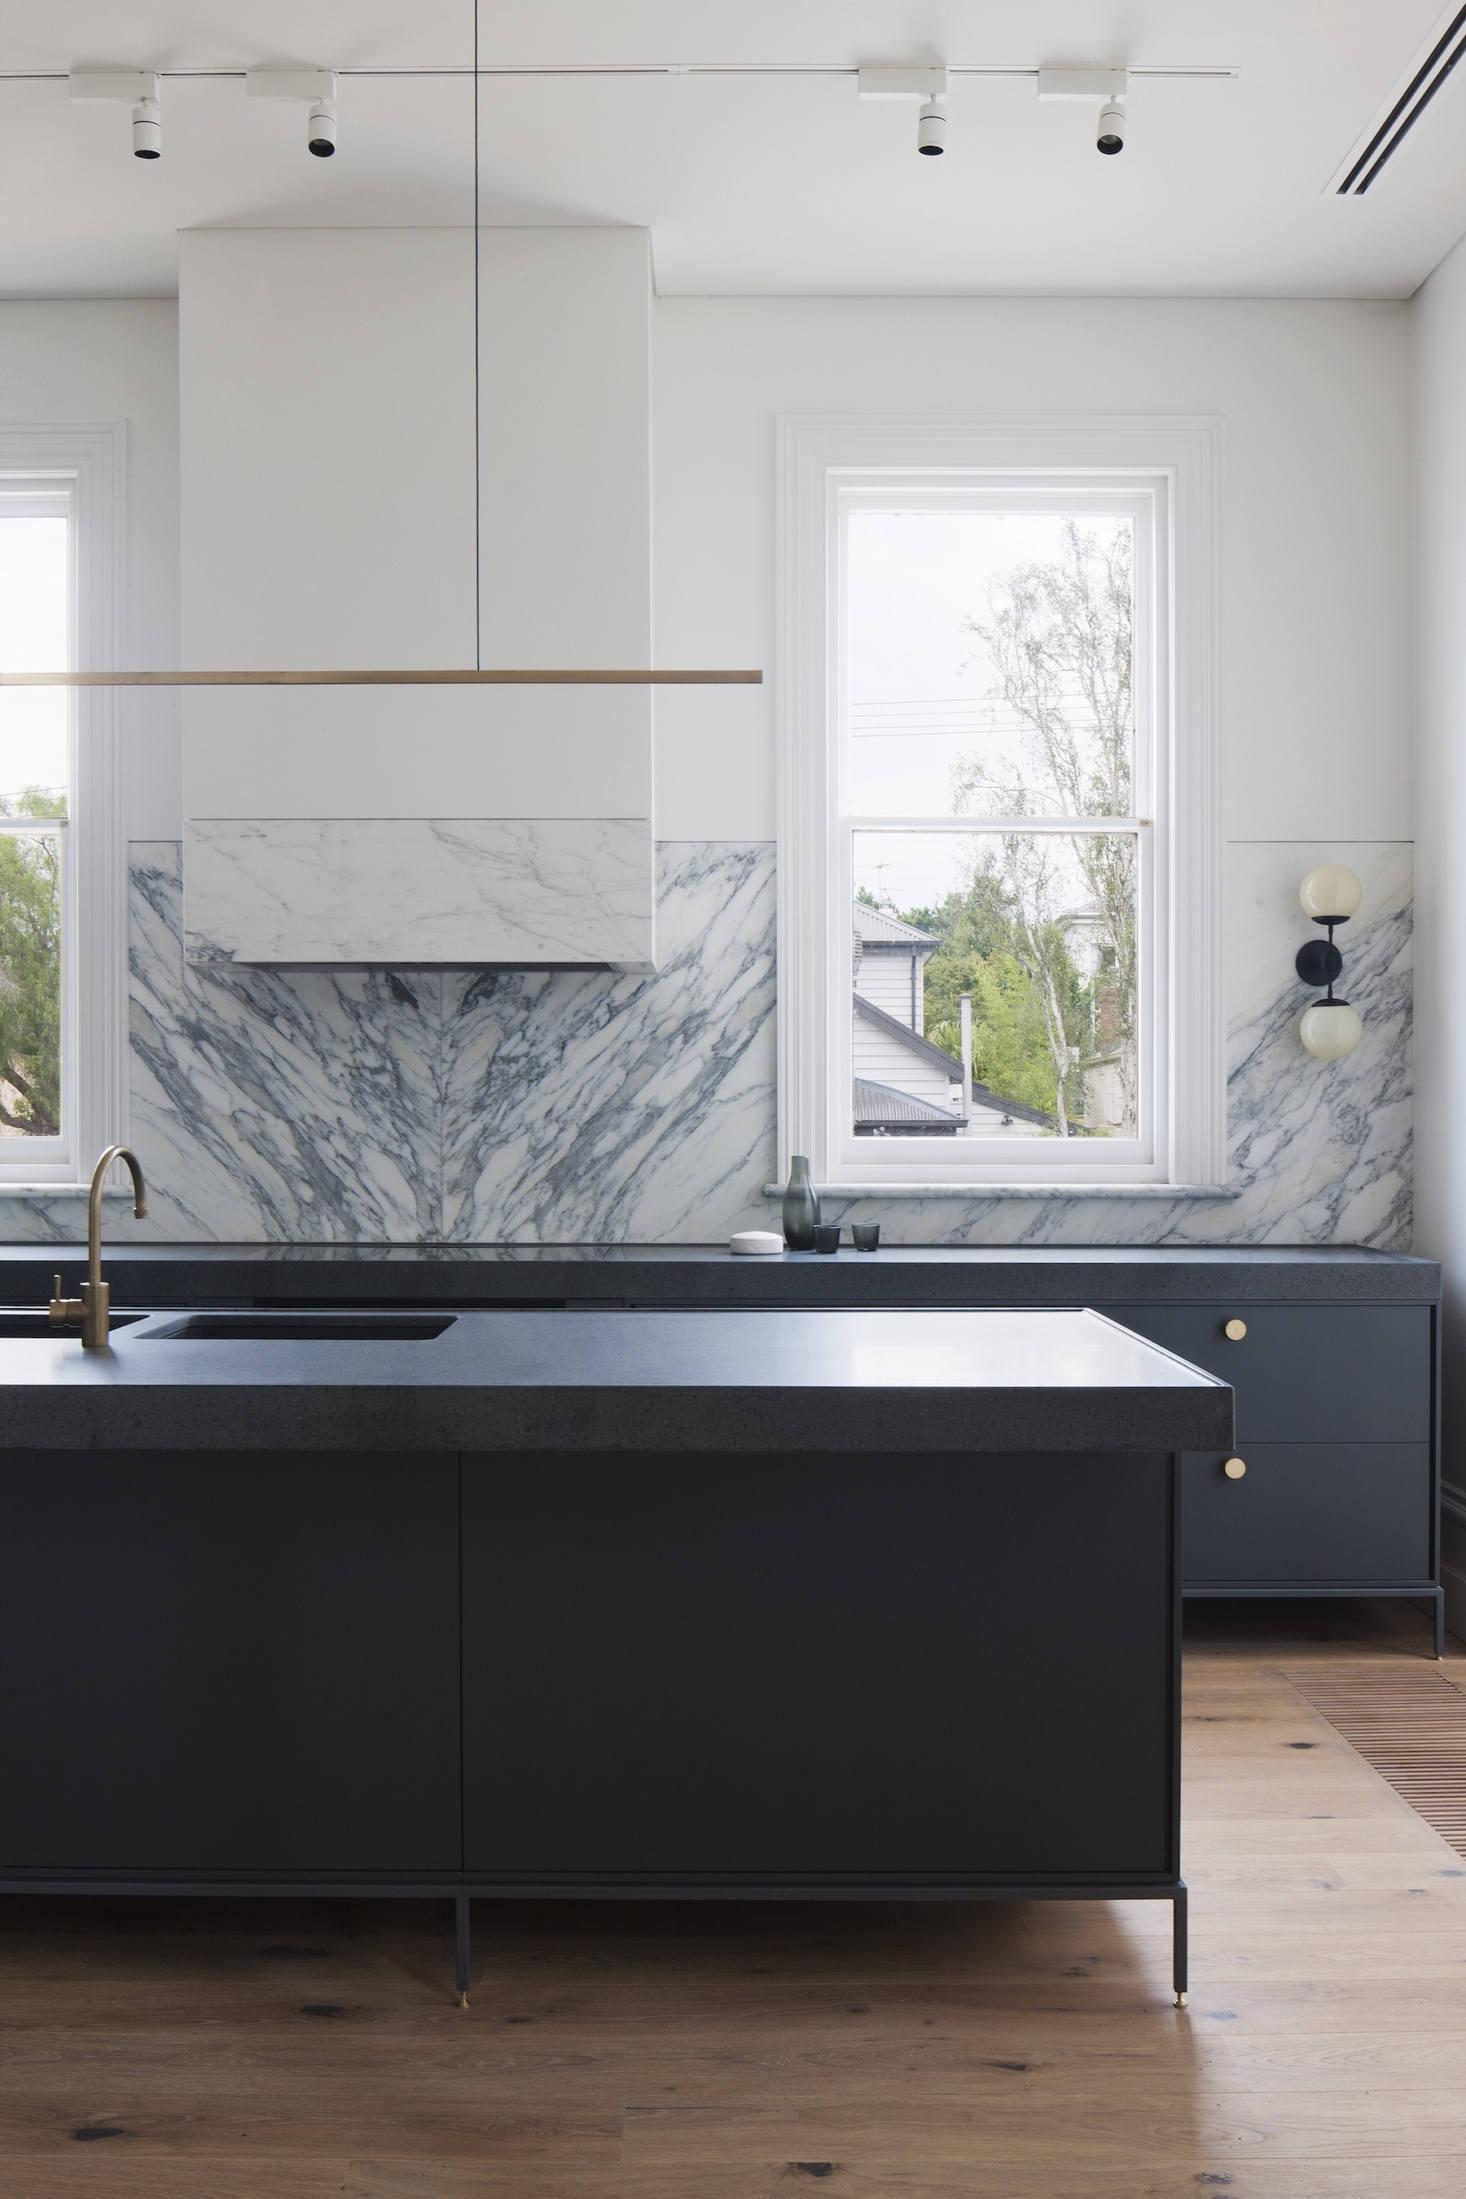 Cool marmor kök backsplash